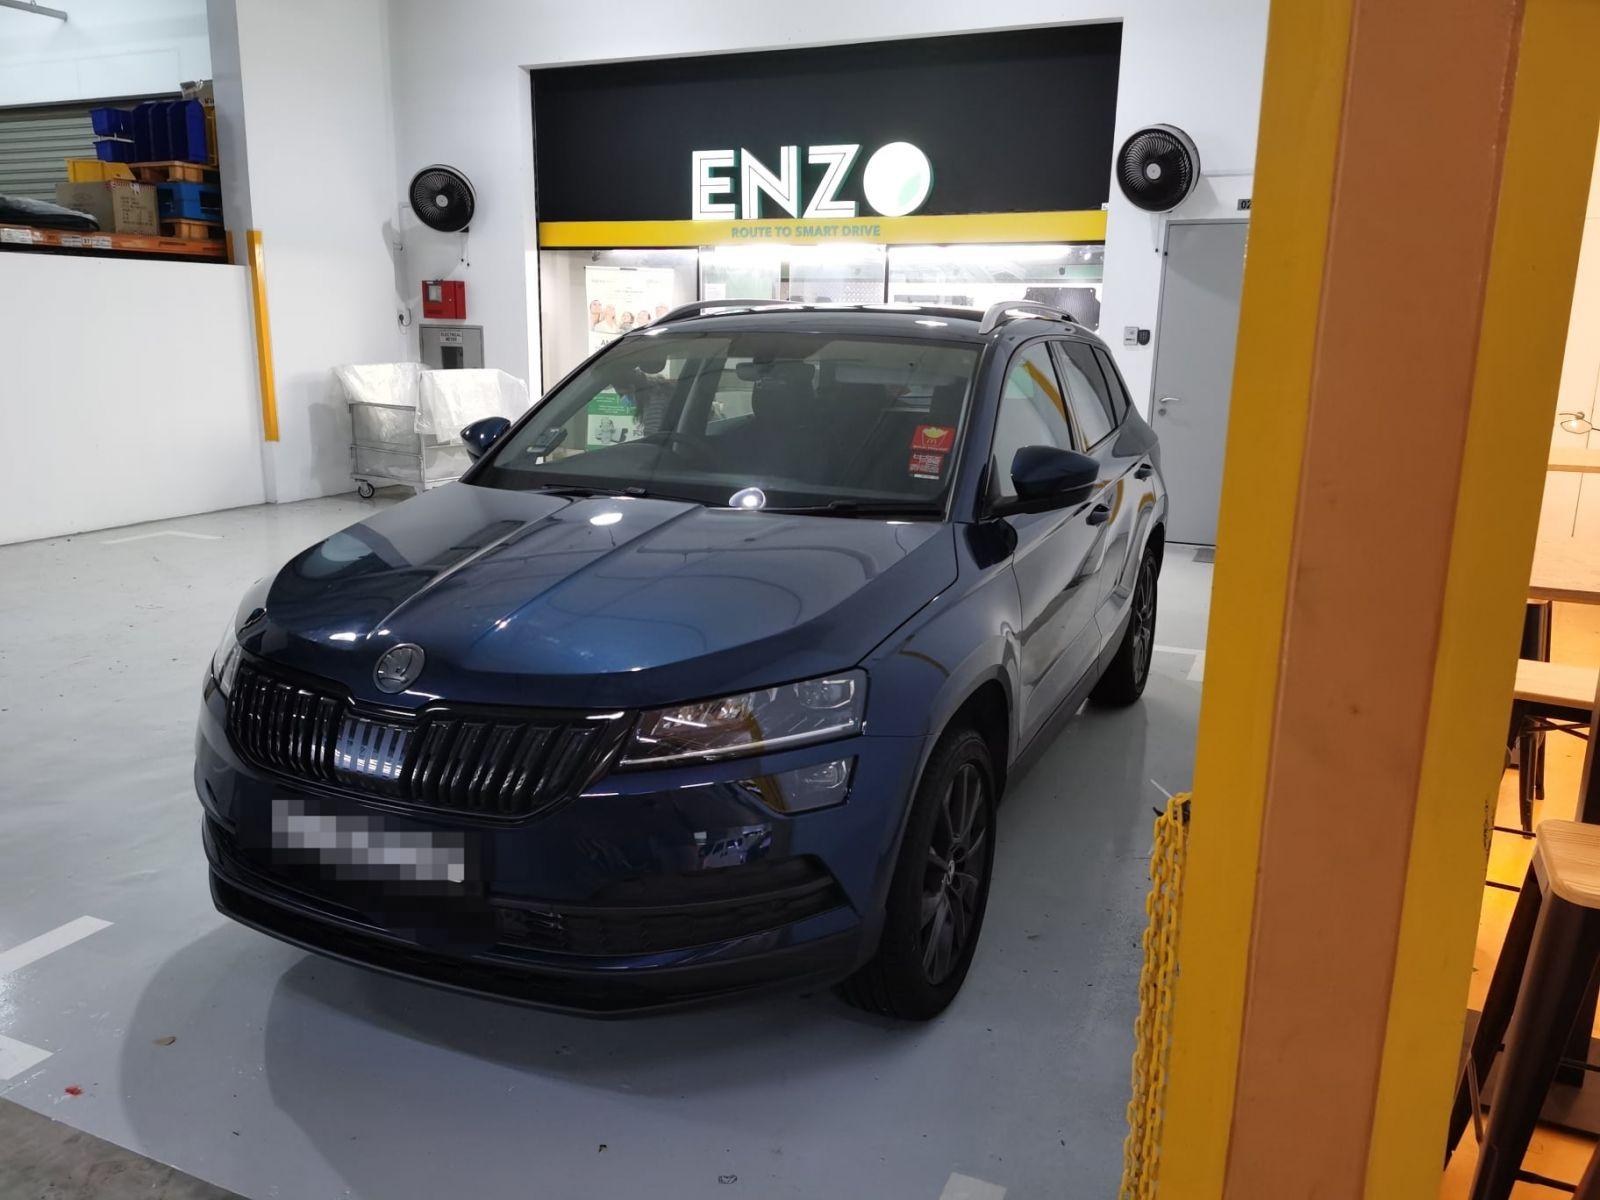 ENZO Skoda Karoq Premium Car Mat